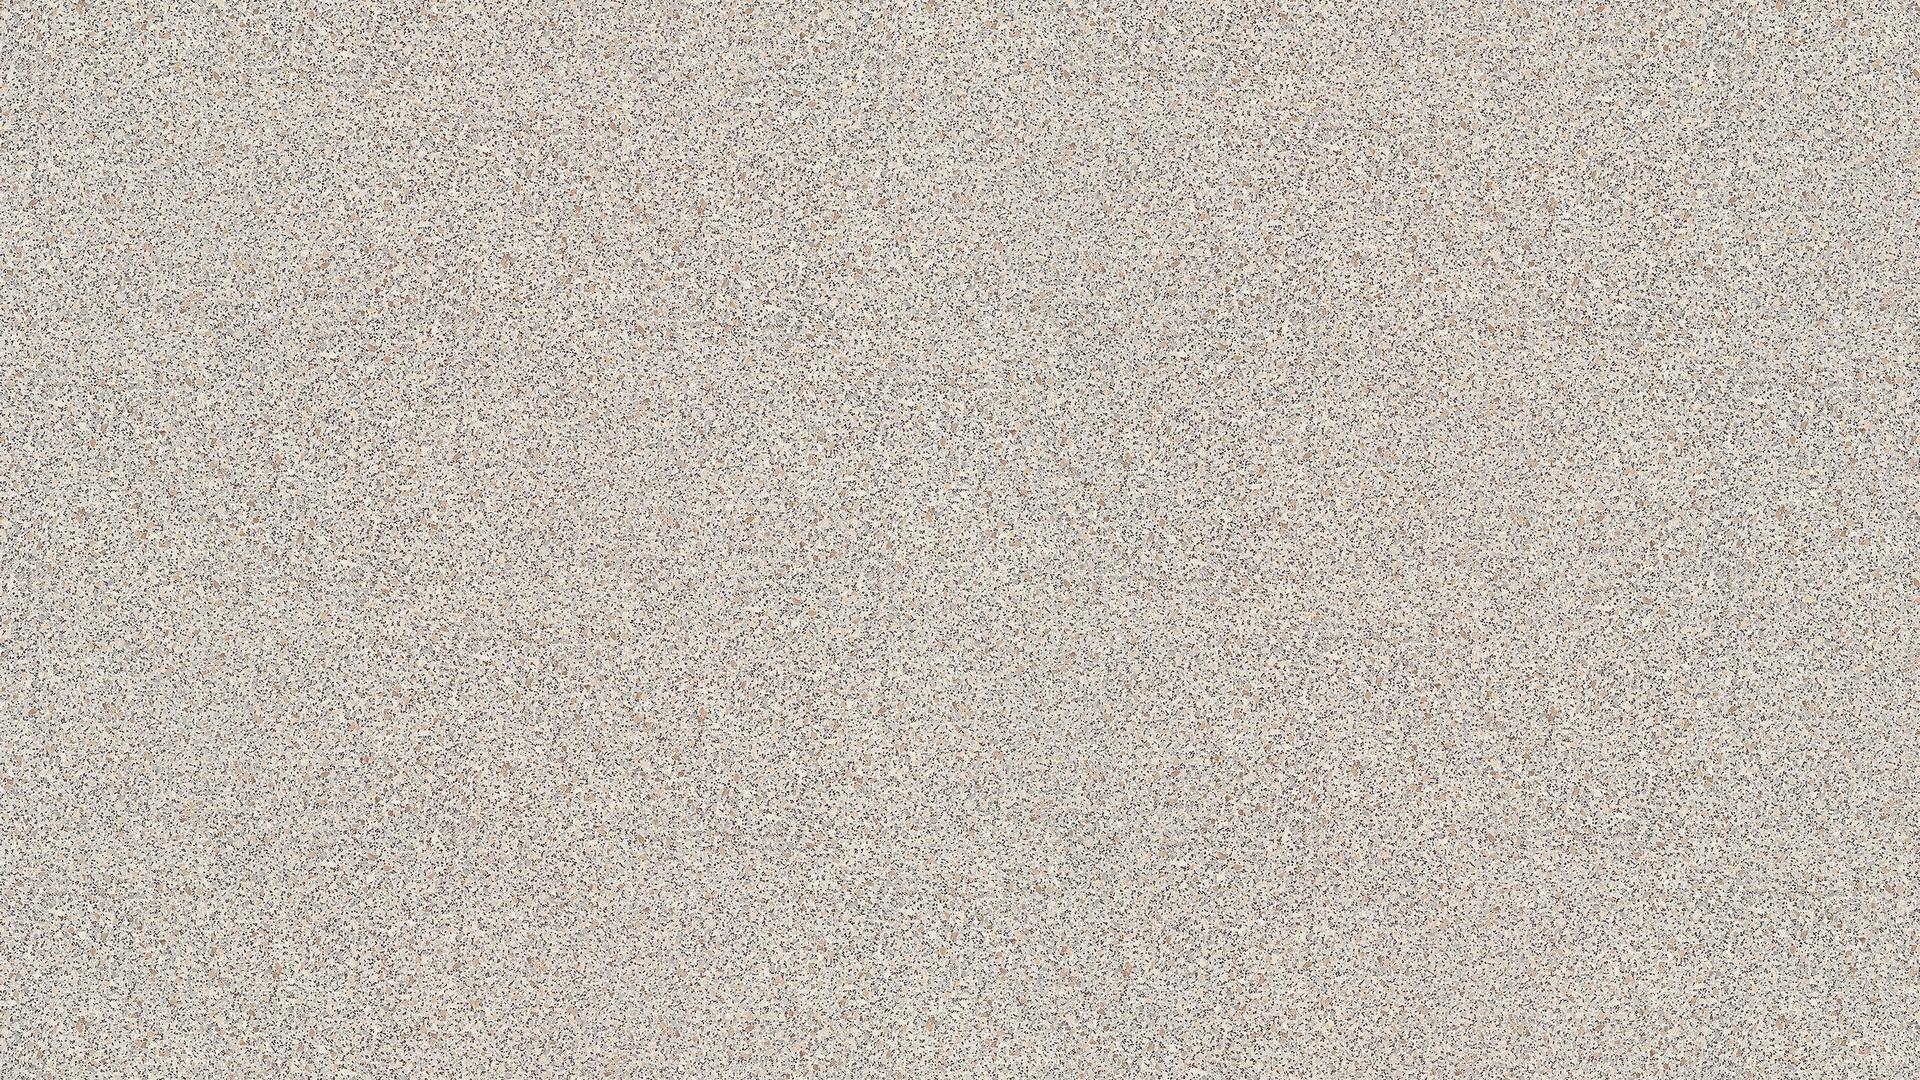 3952 Pe Ravenna Gray Board Kaindl